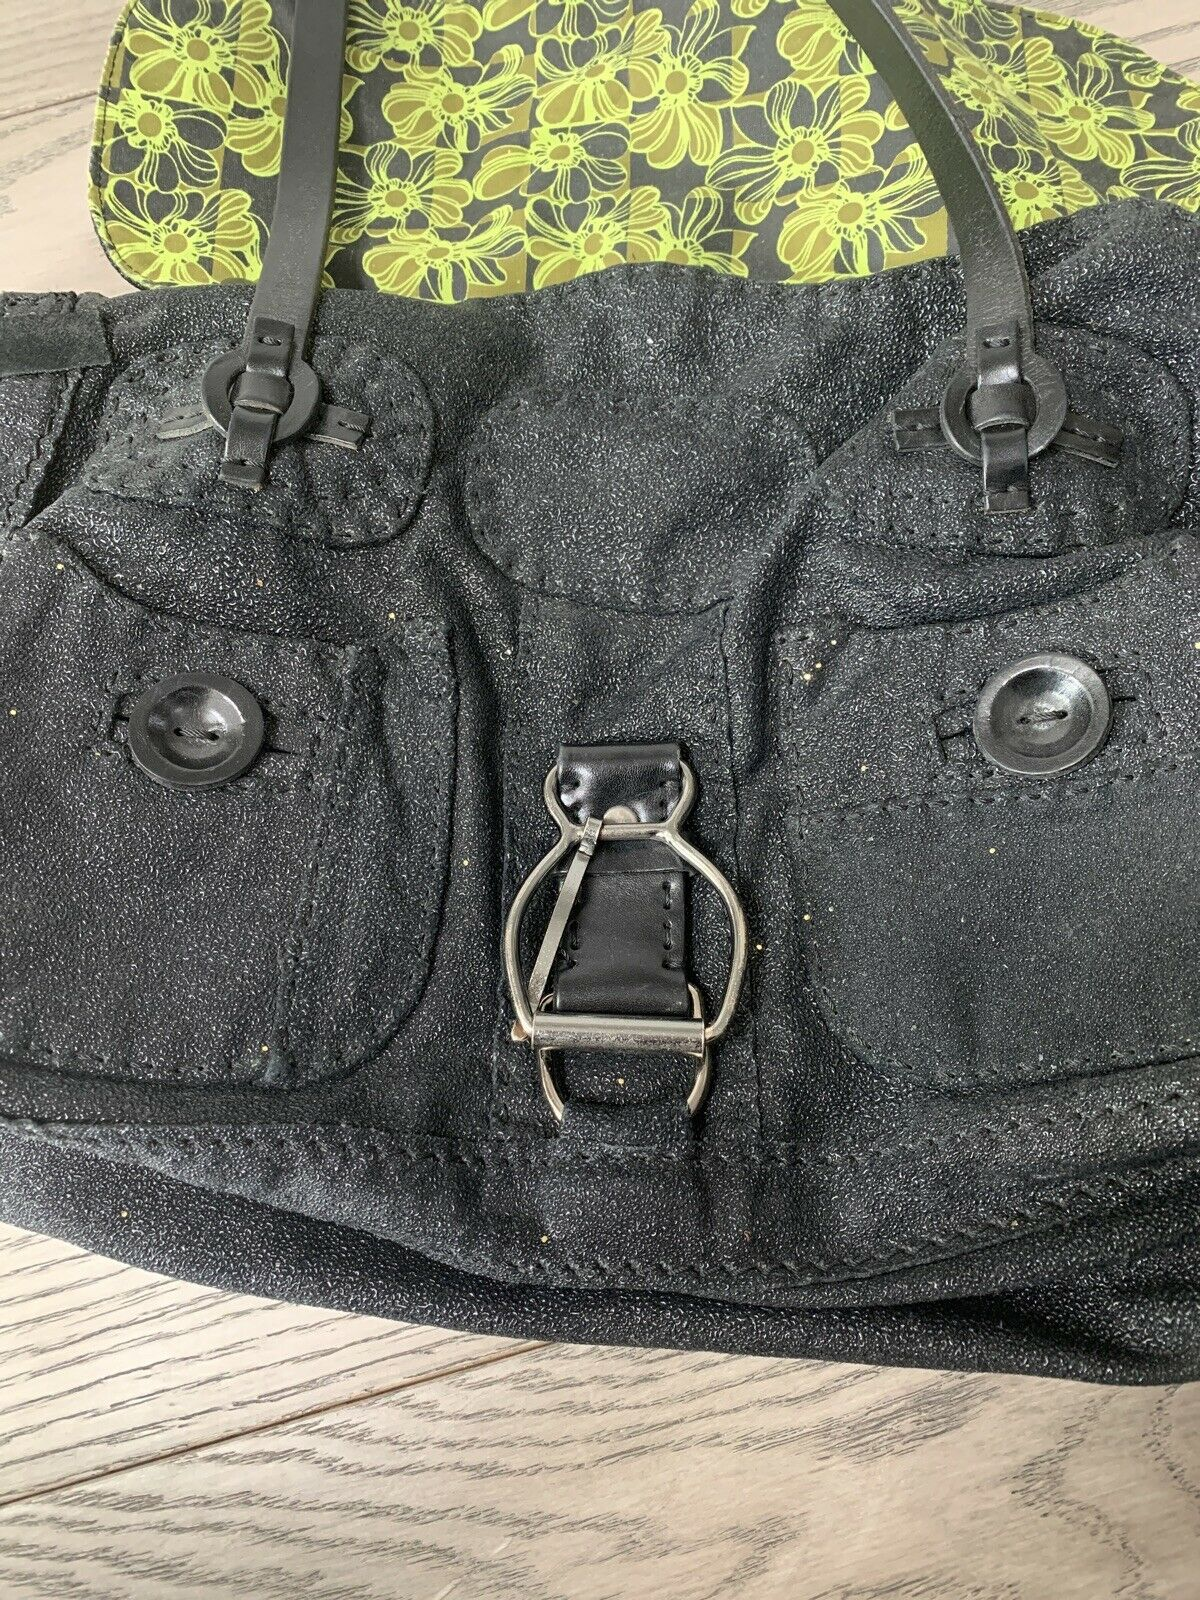 jamin puech handbags - image 6